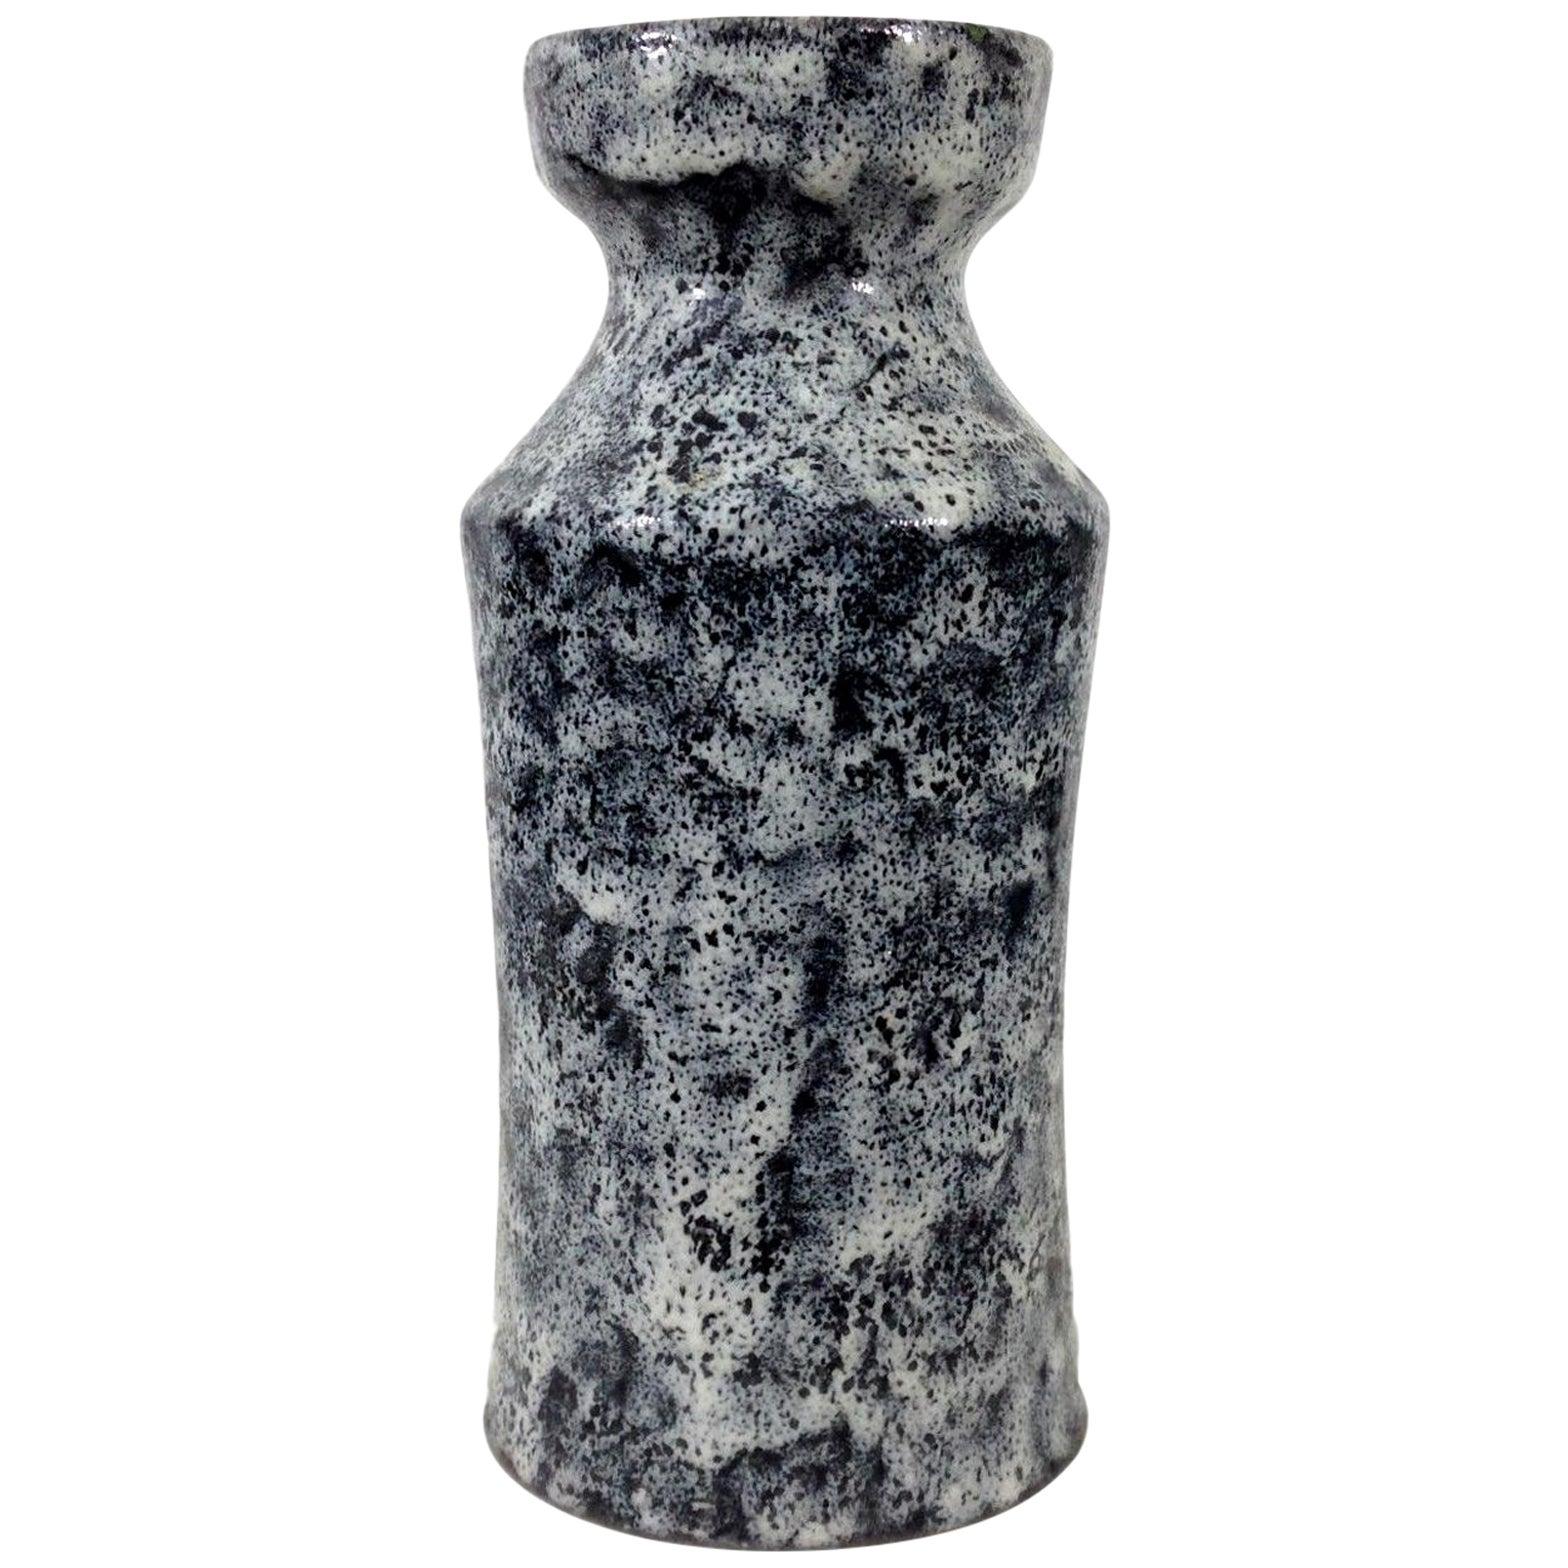 Italian Ceramic Vase by Raymor